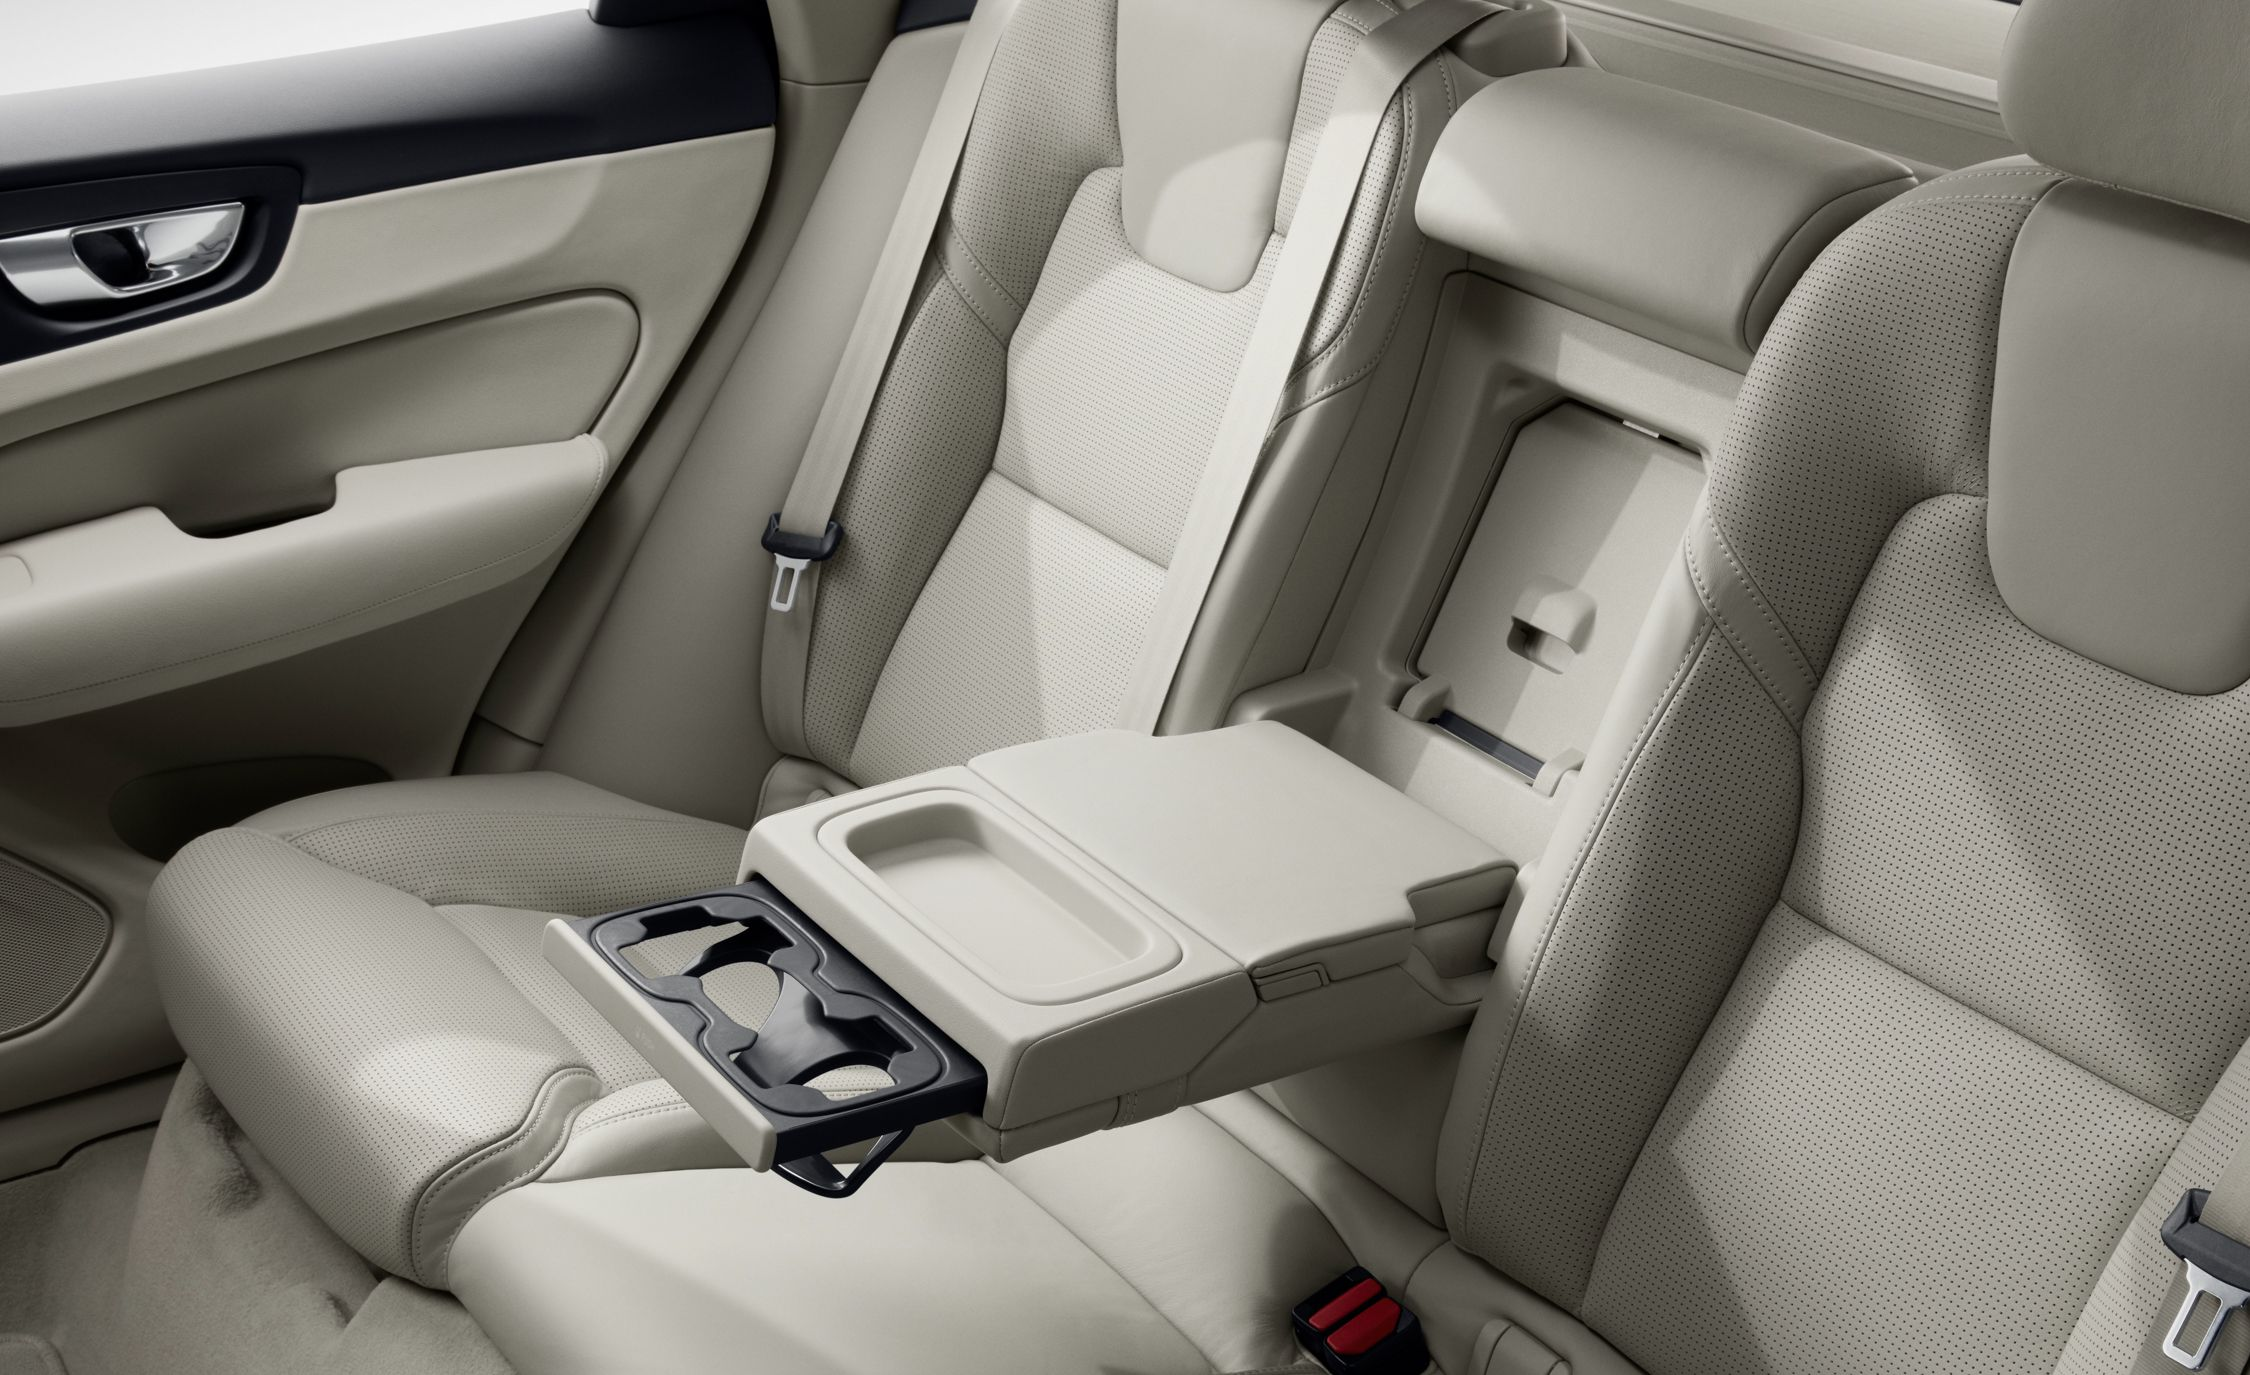 Volvo XC60 Reviews